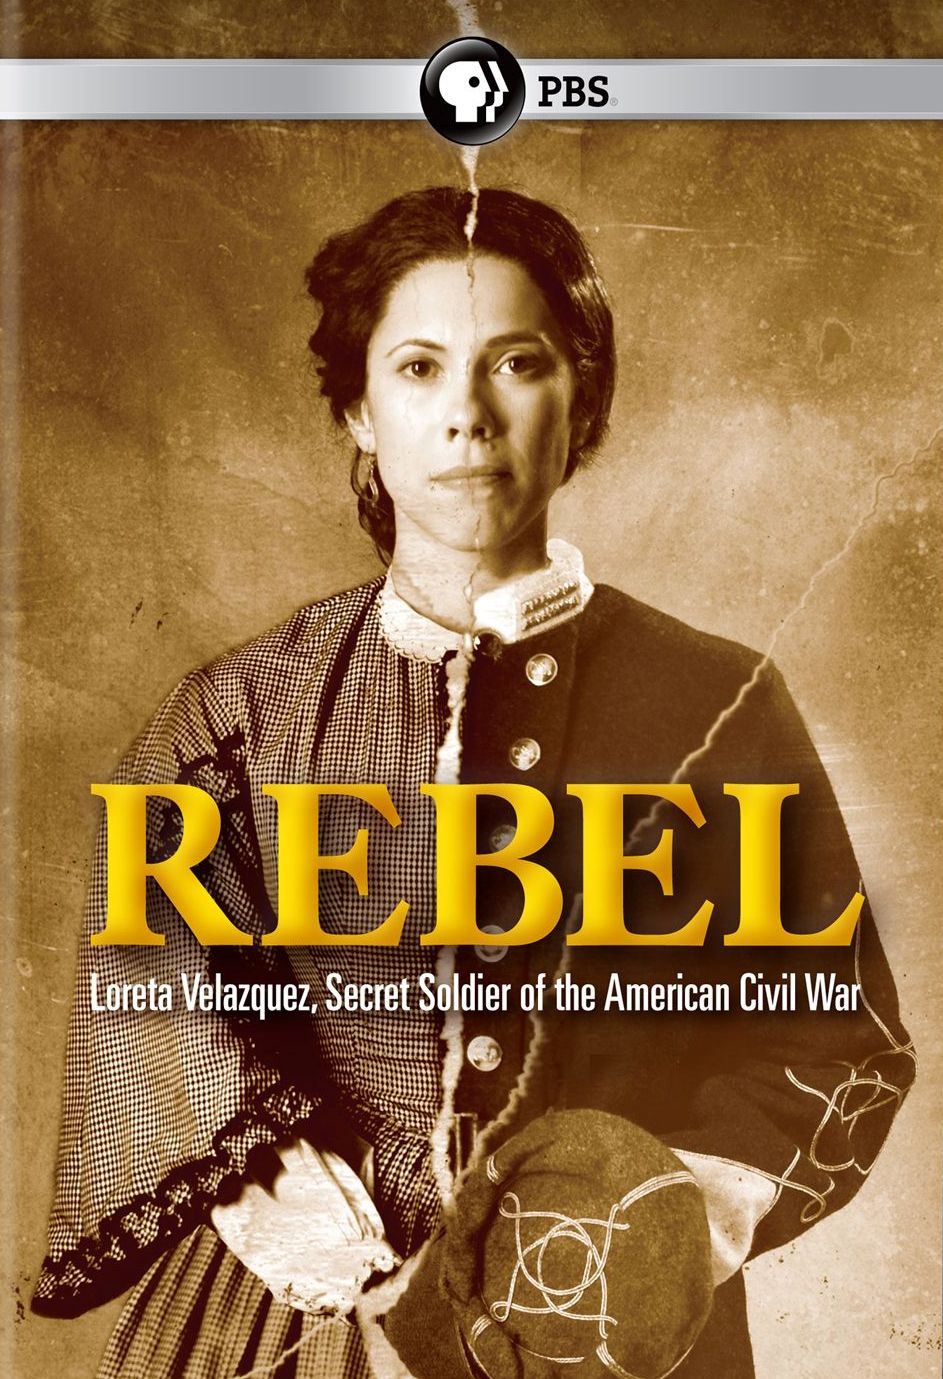 Rebel: Loreta Velazquez, Secret Soldier of the American Civil War